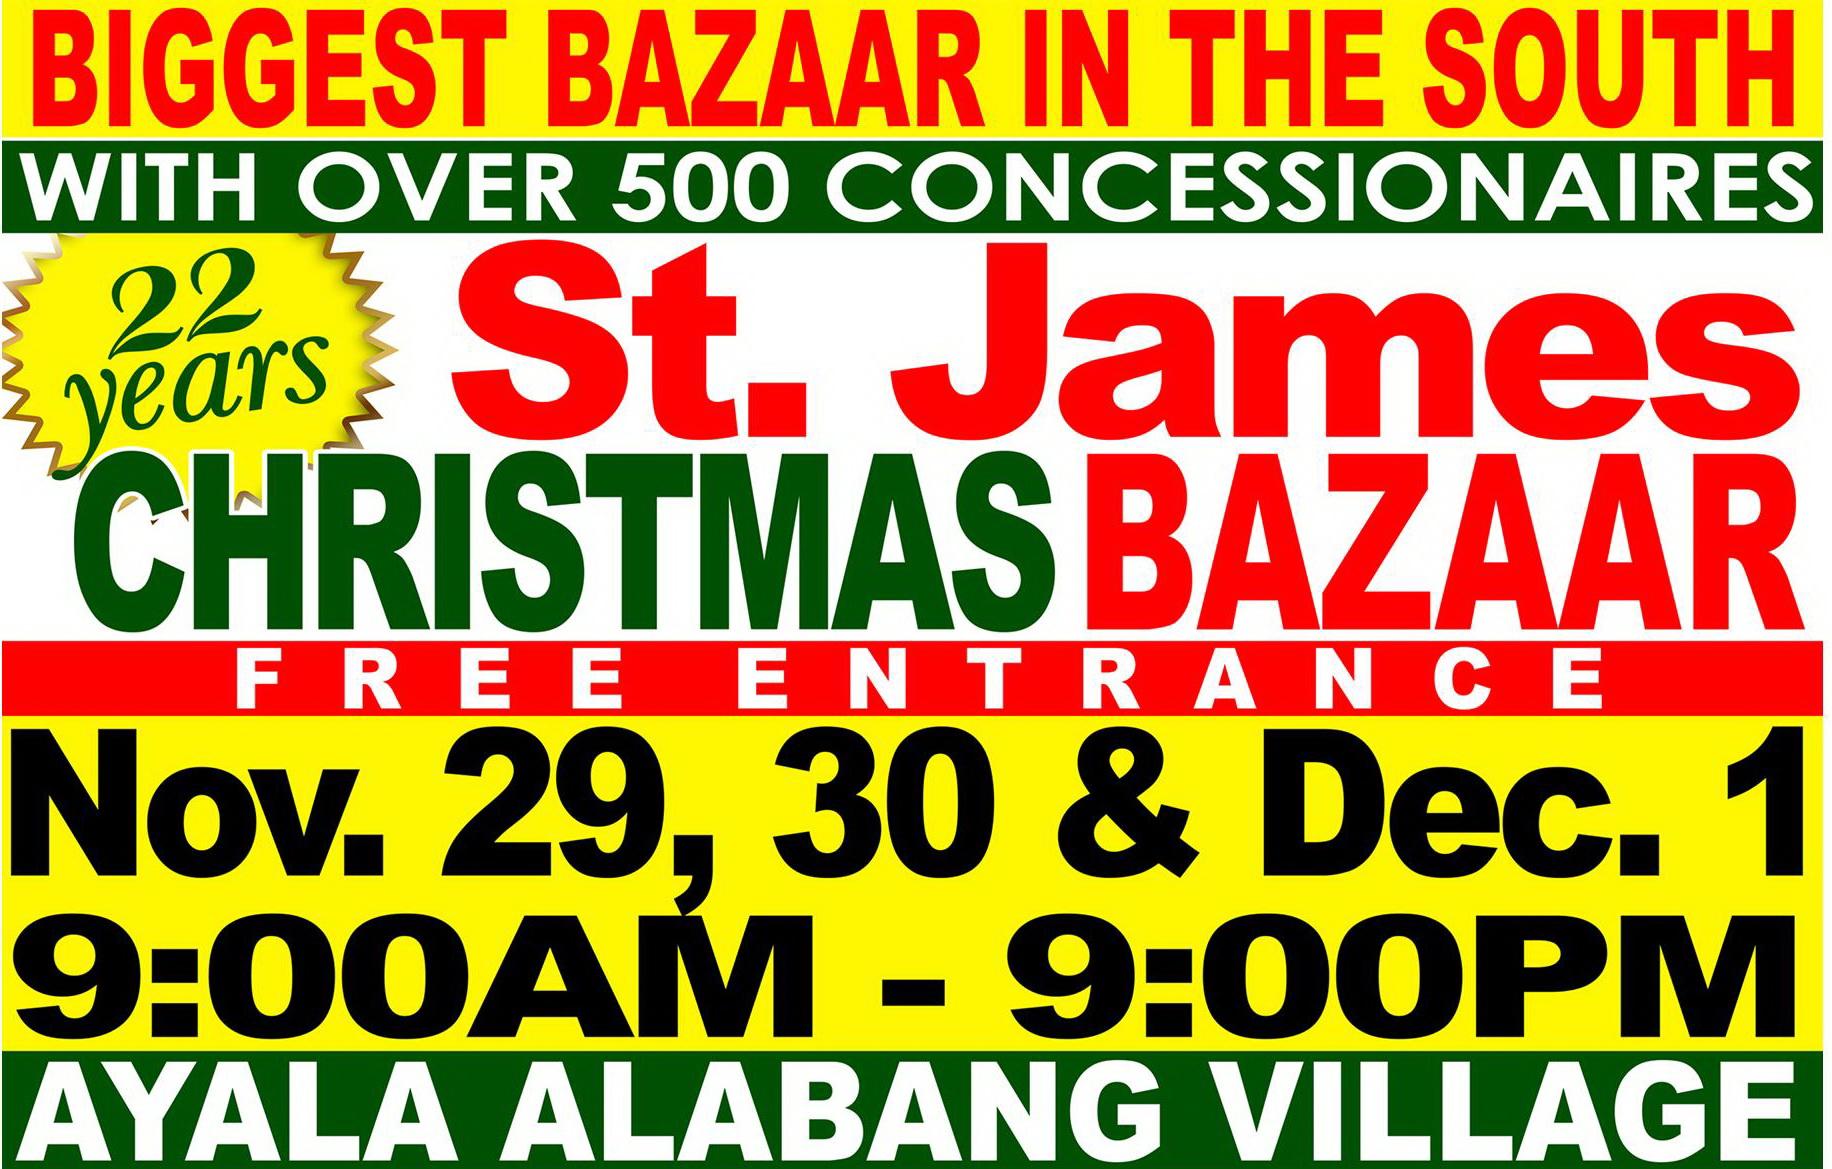 St. James Christmas Bazaar @ Ayala Alabang Village November - December 2013